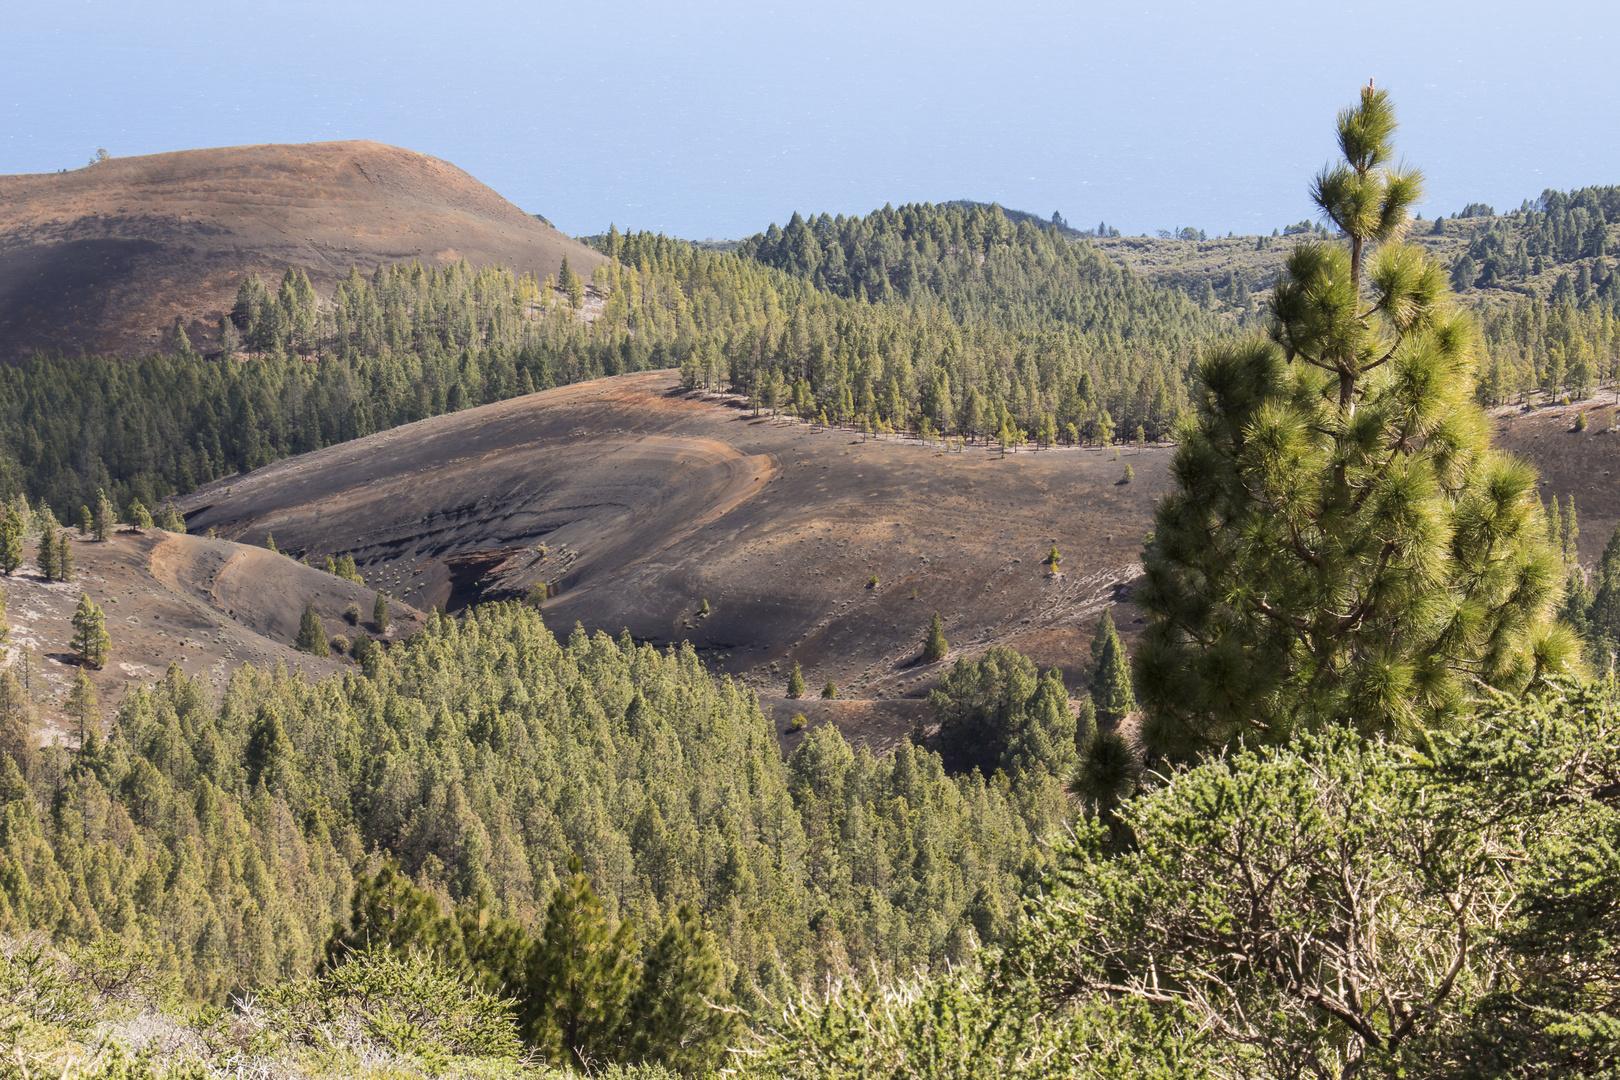 Vulkanlandschaft auf der Insel La Palma